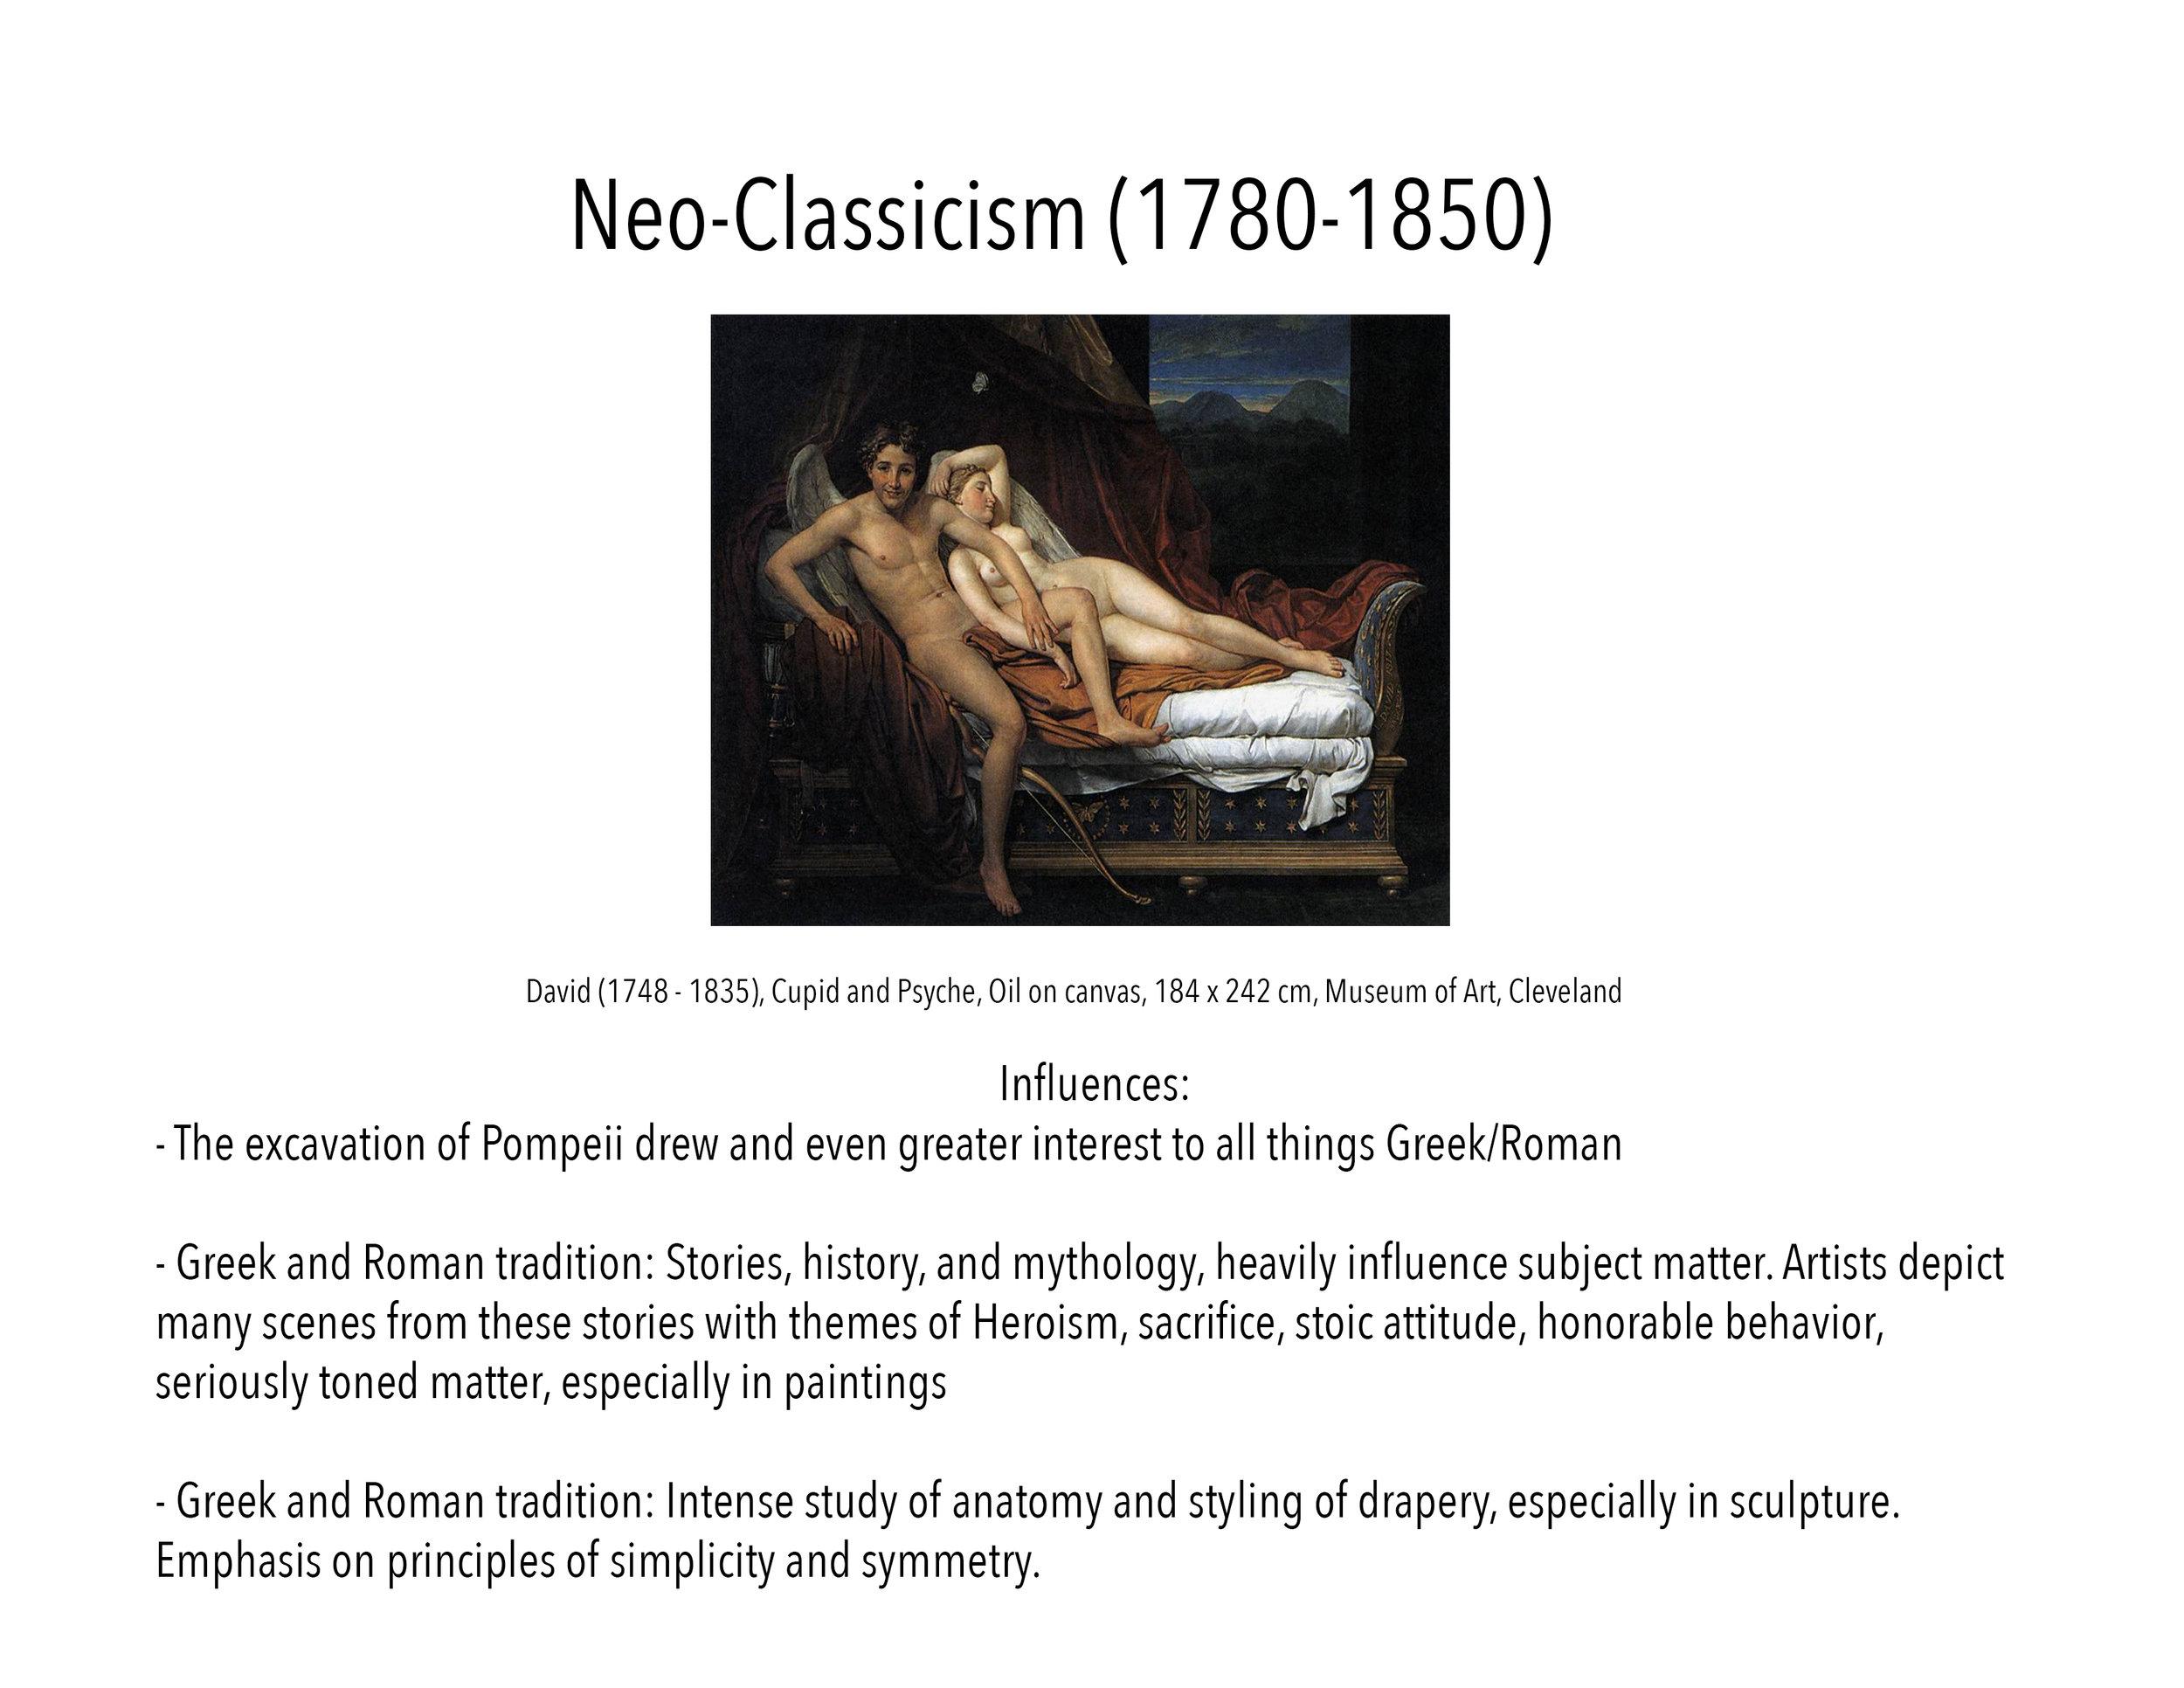 Neo-Classicism (1780-1850).jpg